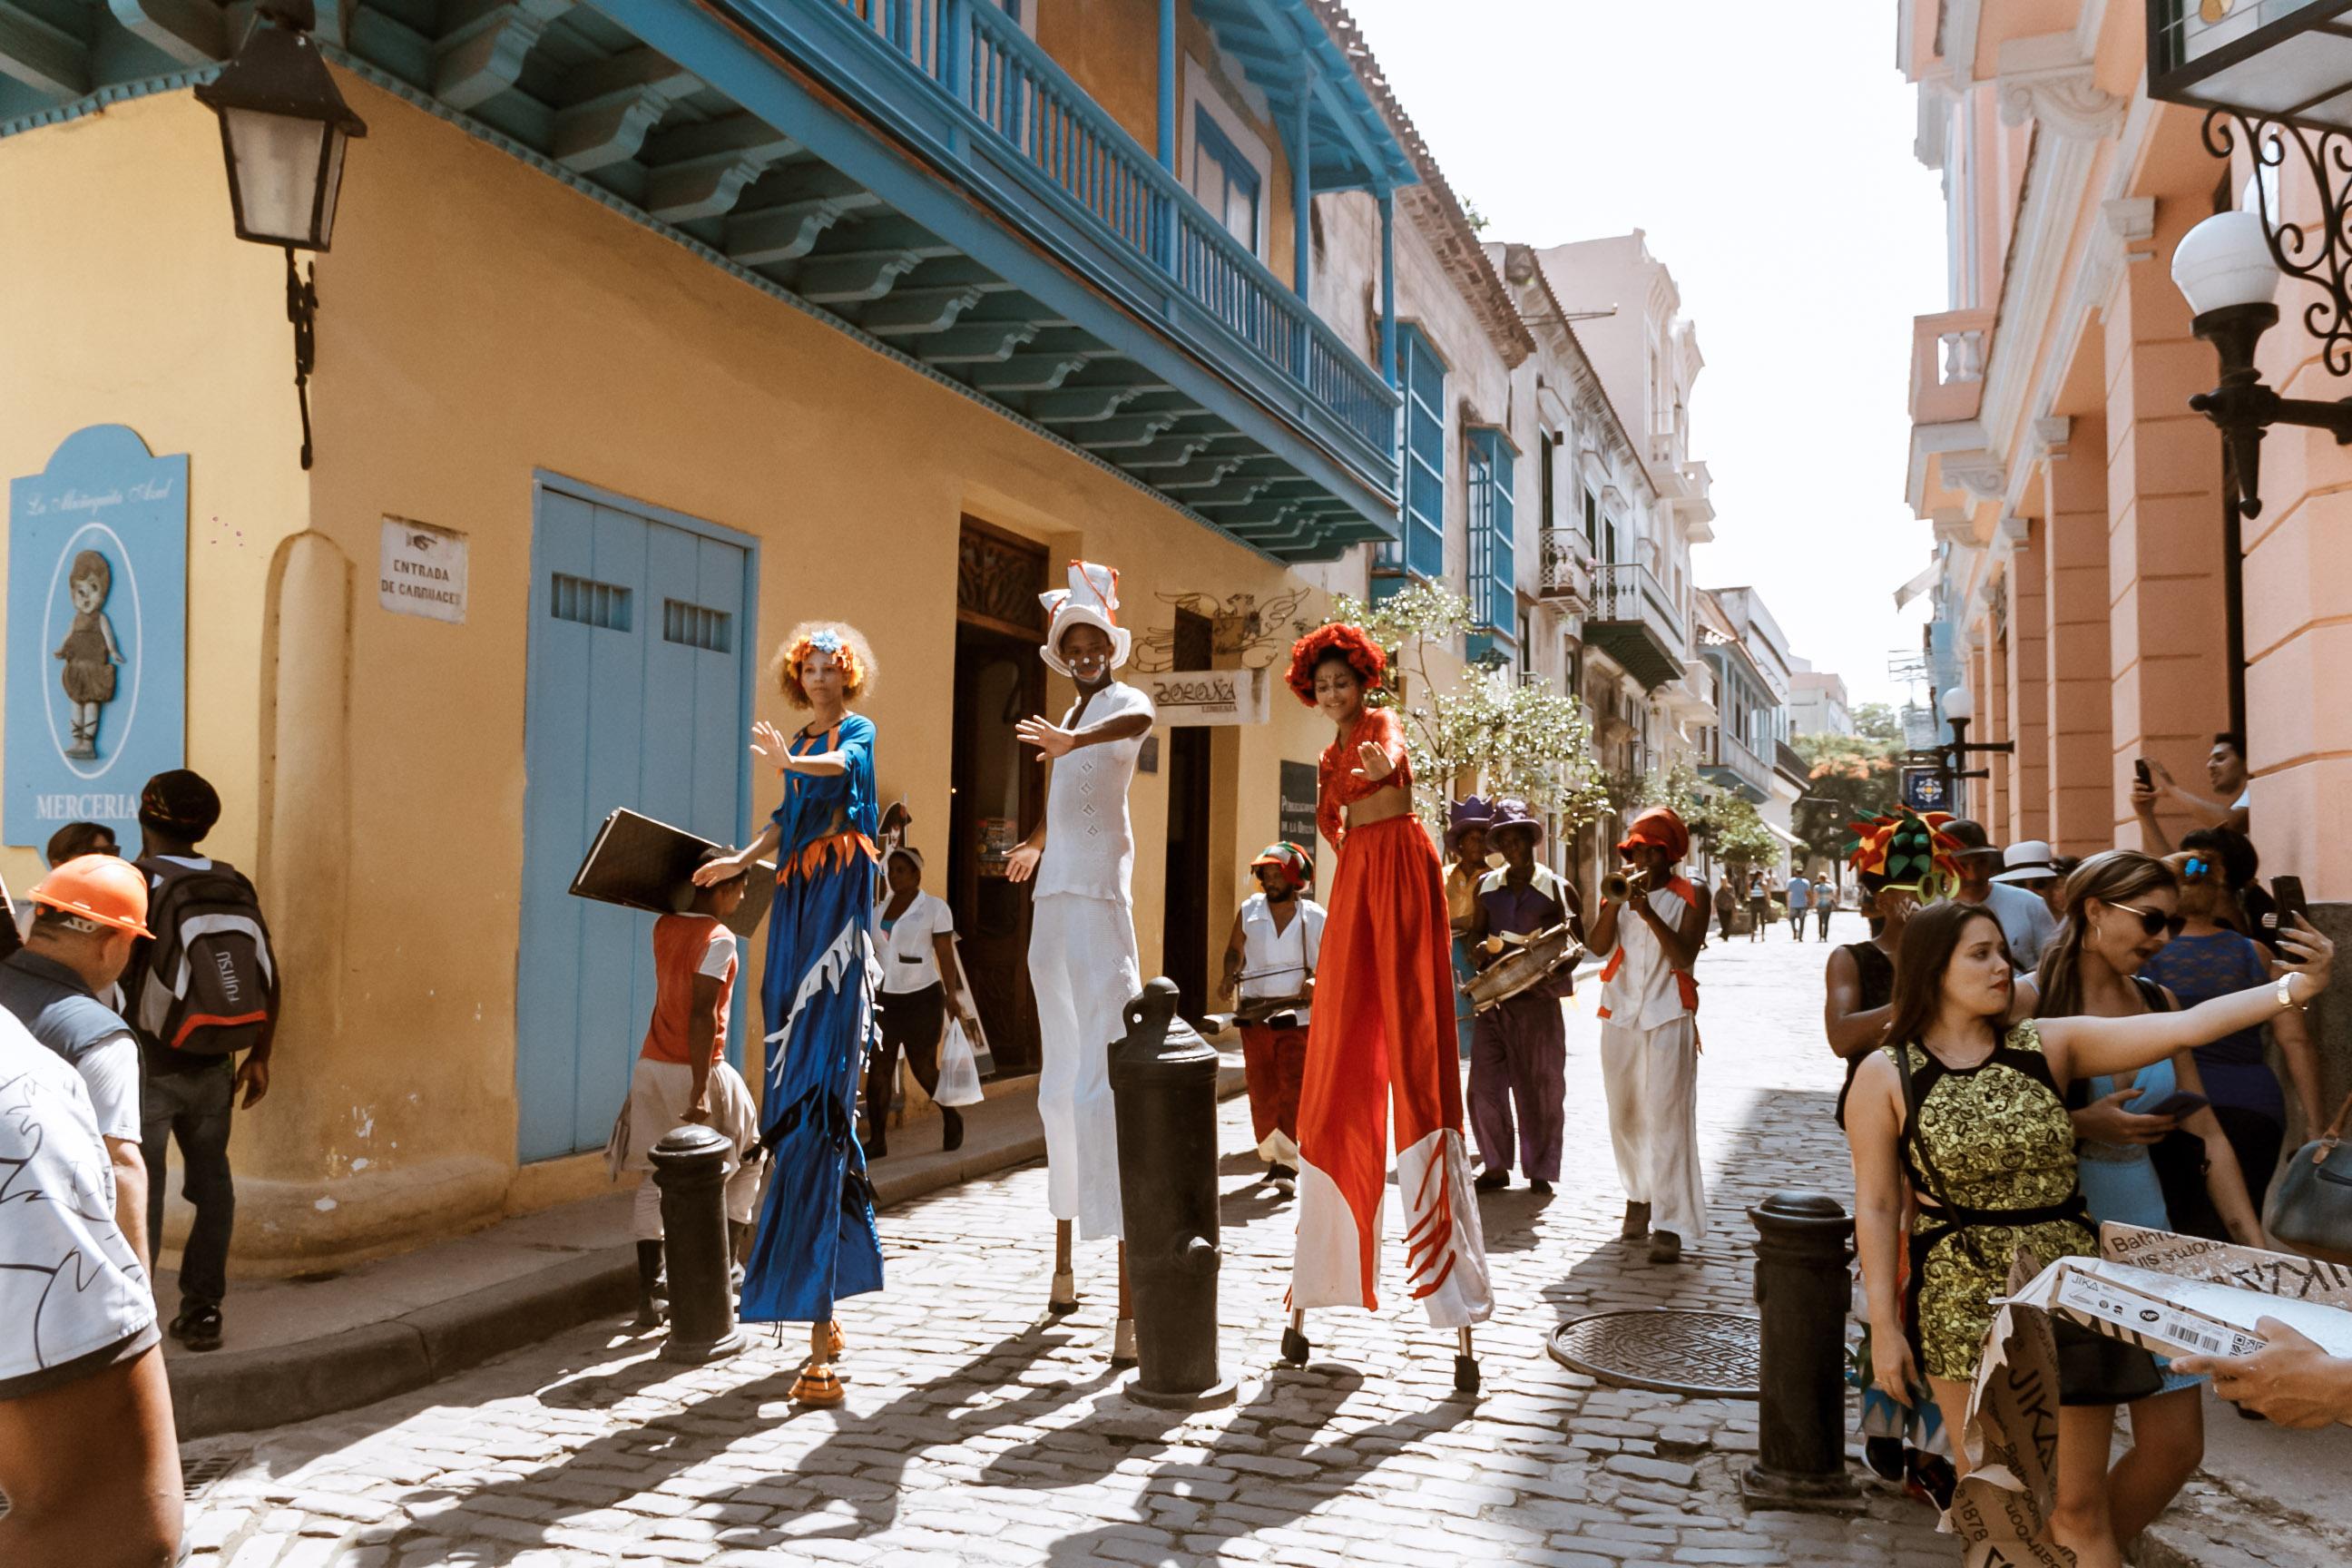 Straßen oller Menschen in Kuba.